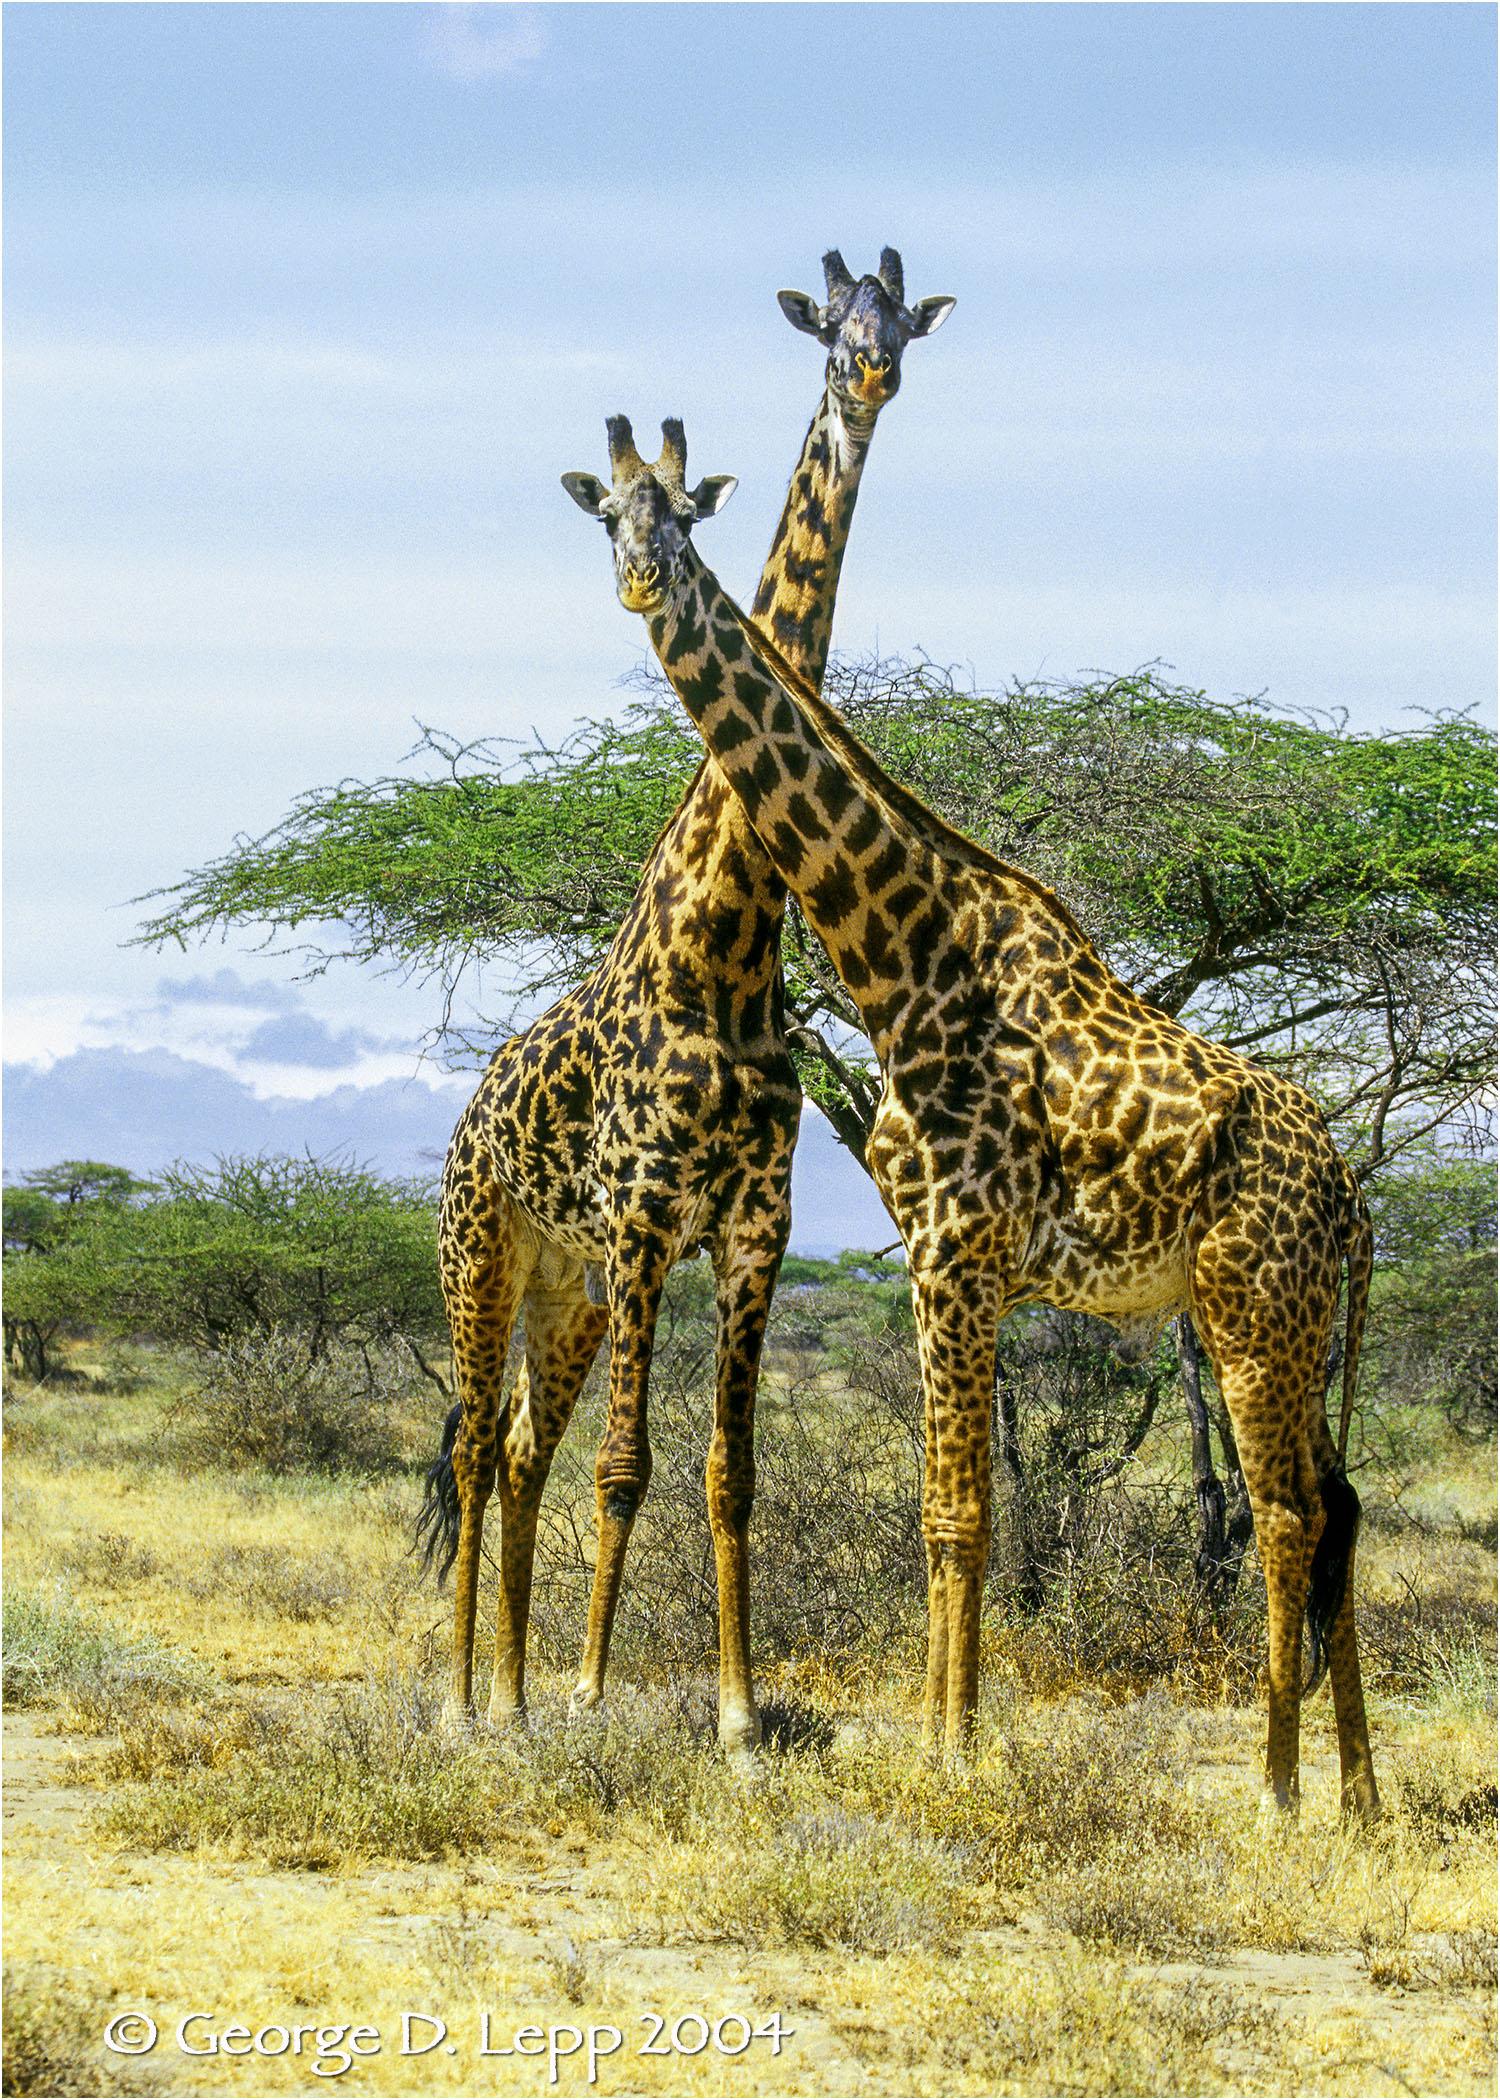 Giraffes in Tanzania. © George D. Lepp 2001 M-GI-0002